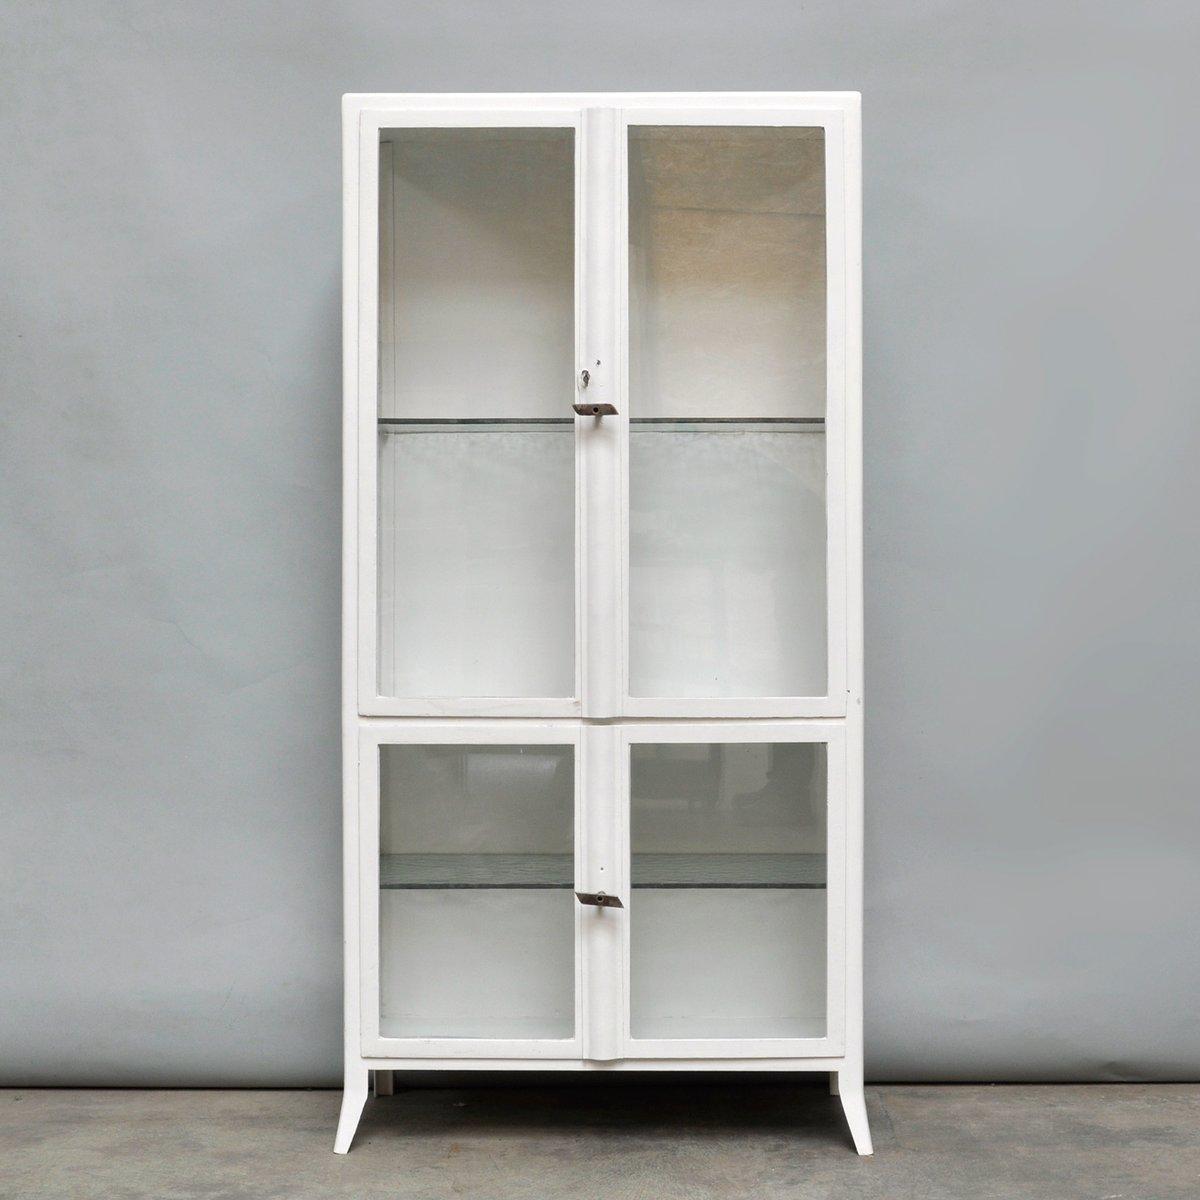 armoire pharmacie vintage en fer et verre 1950s en vente sur pamono. Black Bedroom Furniture Sets. Home Design Ideas